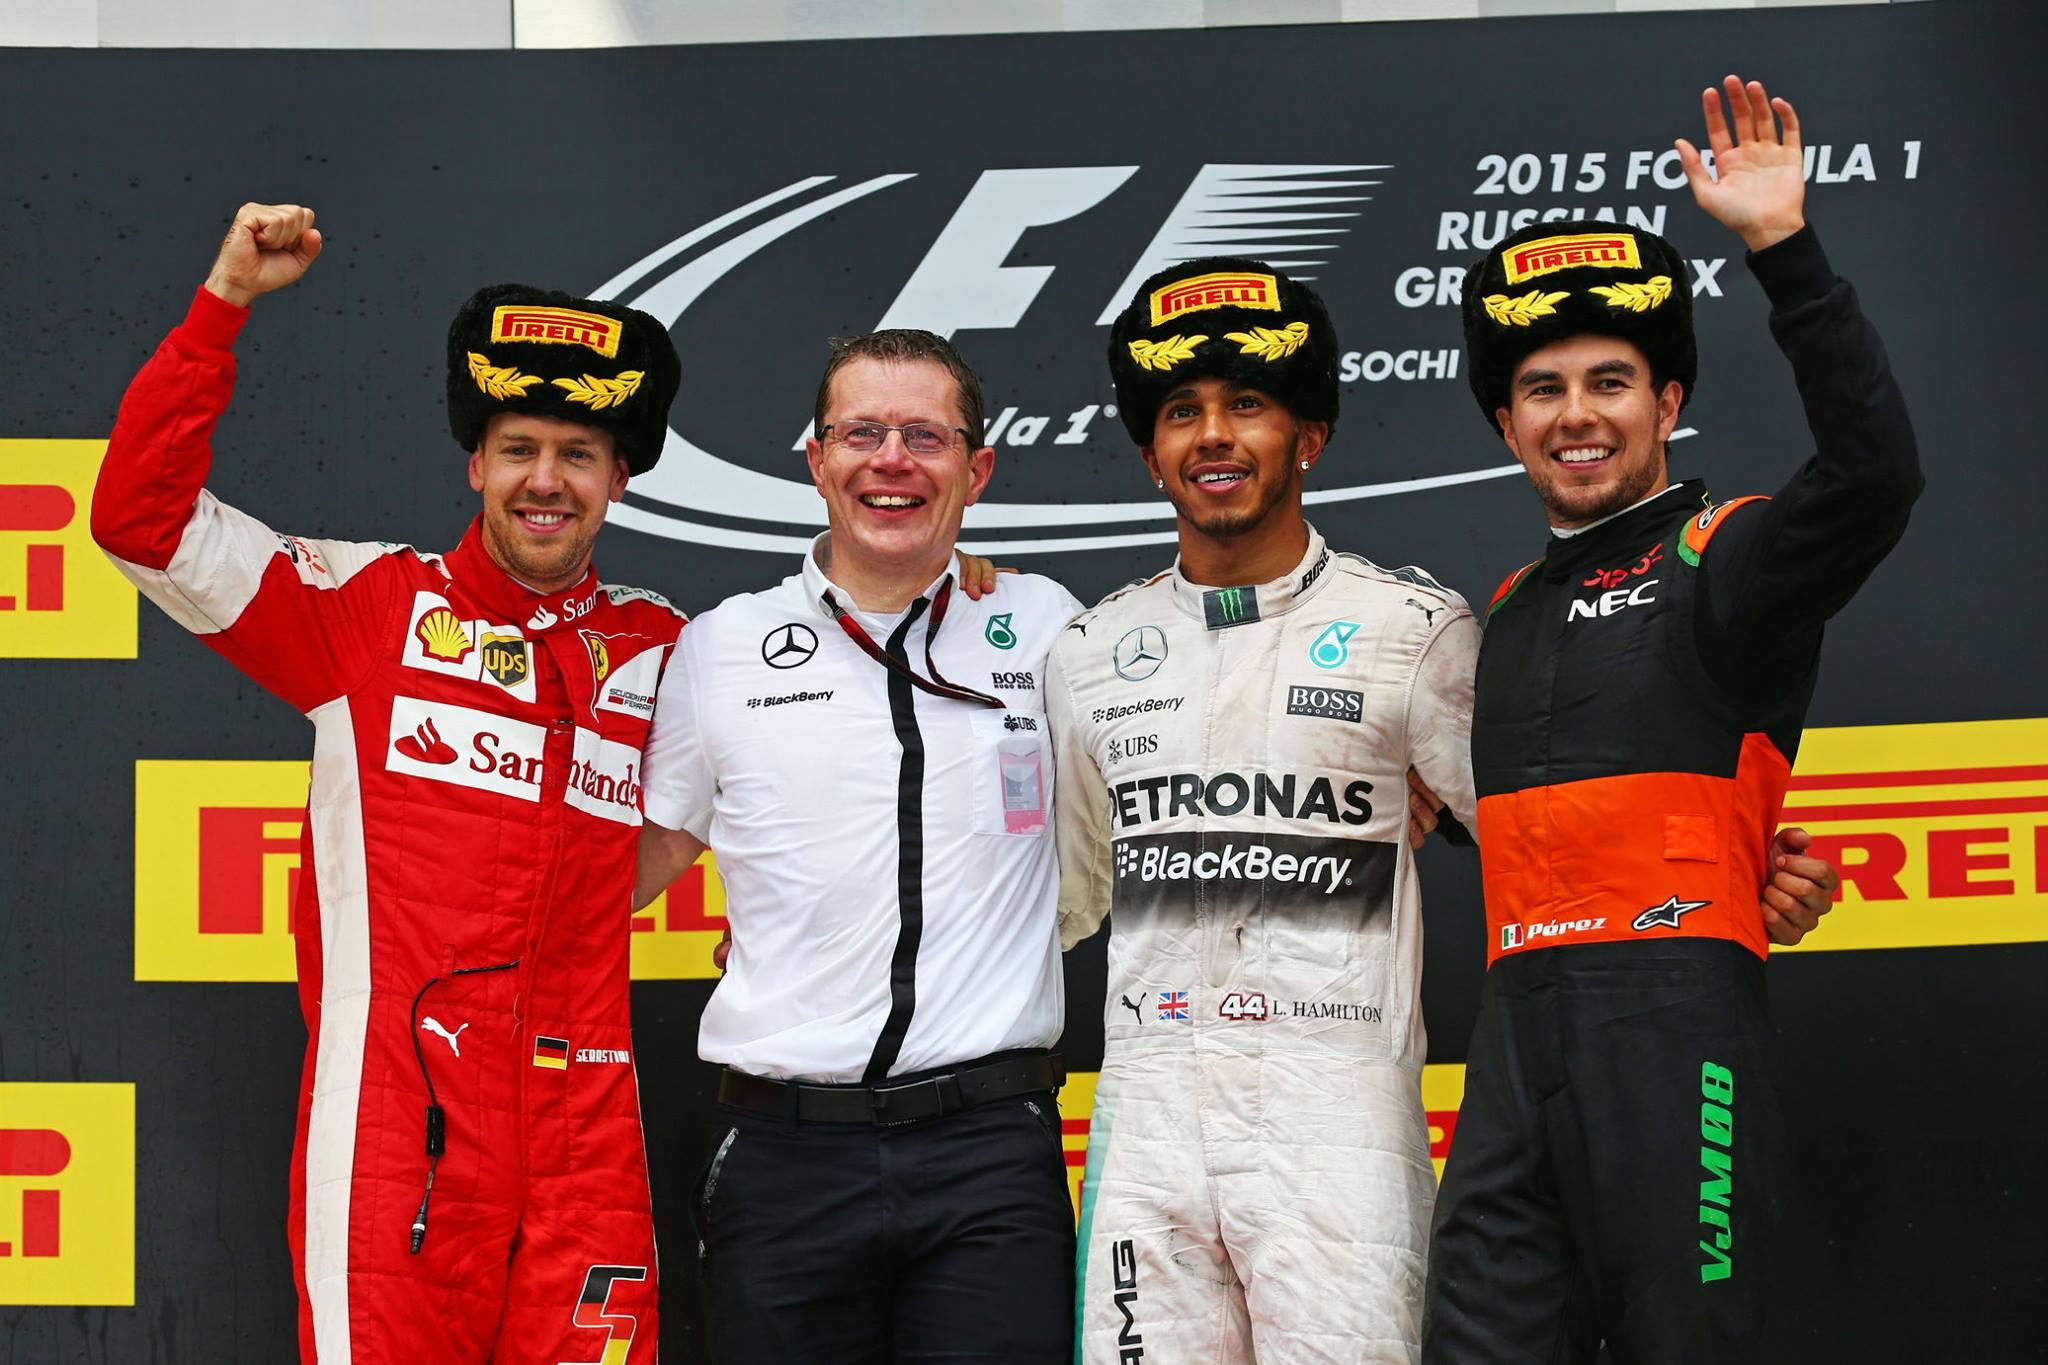 Pódio Russo na Formula 1 Vettev, Hamiltokencho e Perezkov